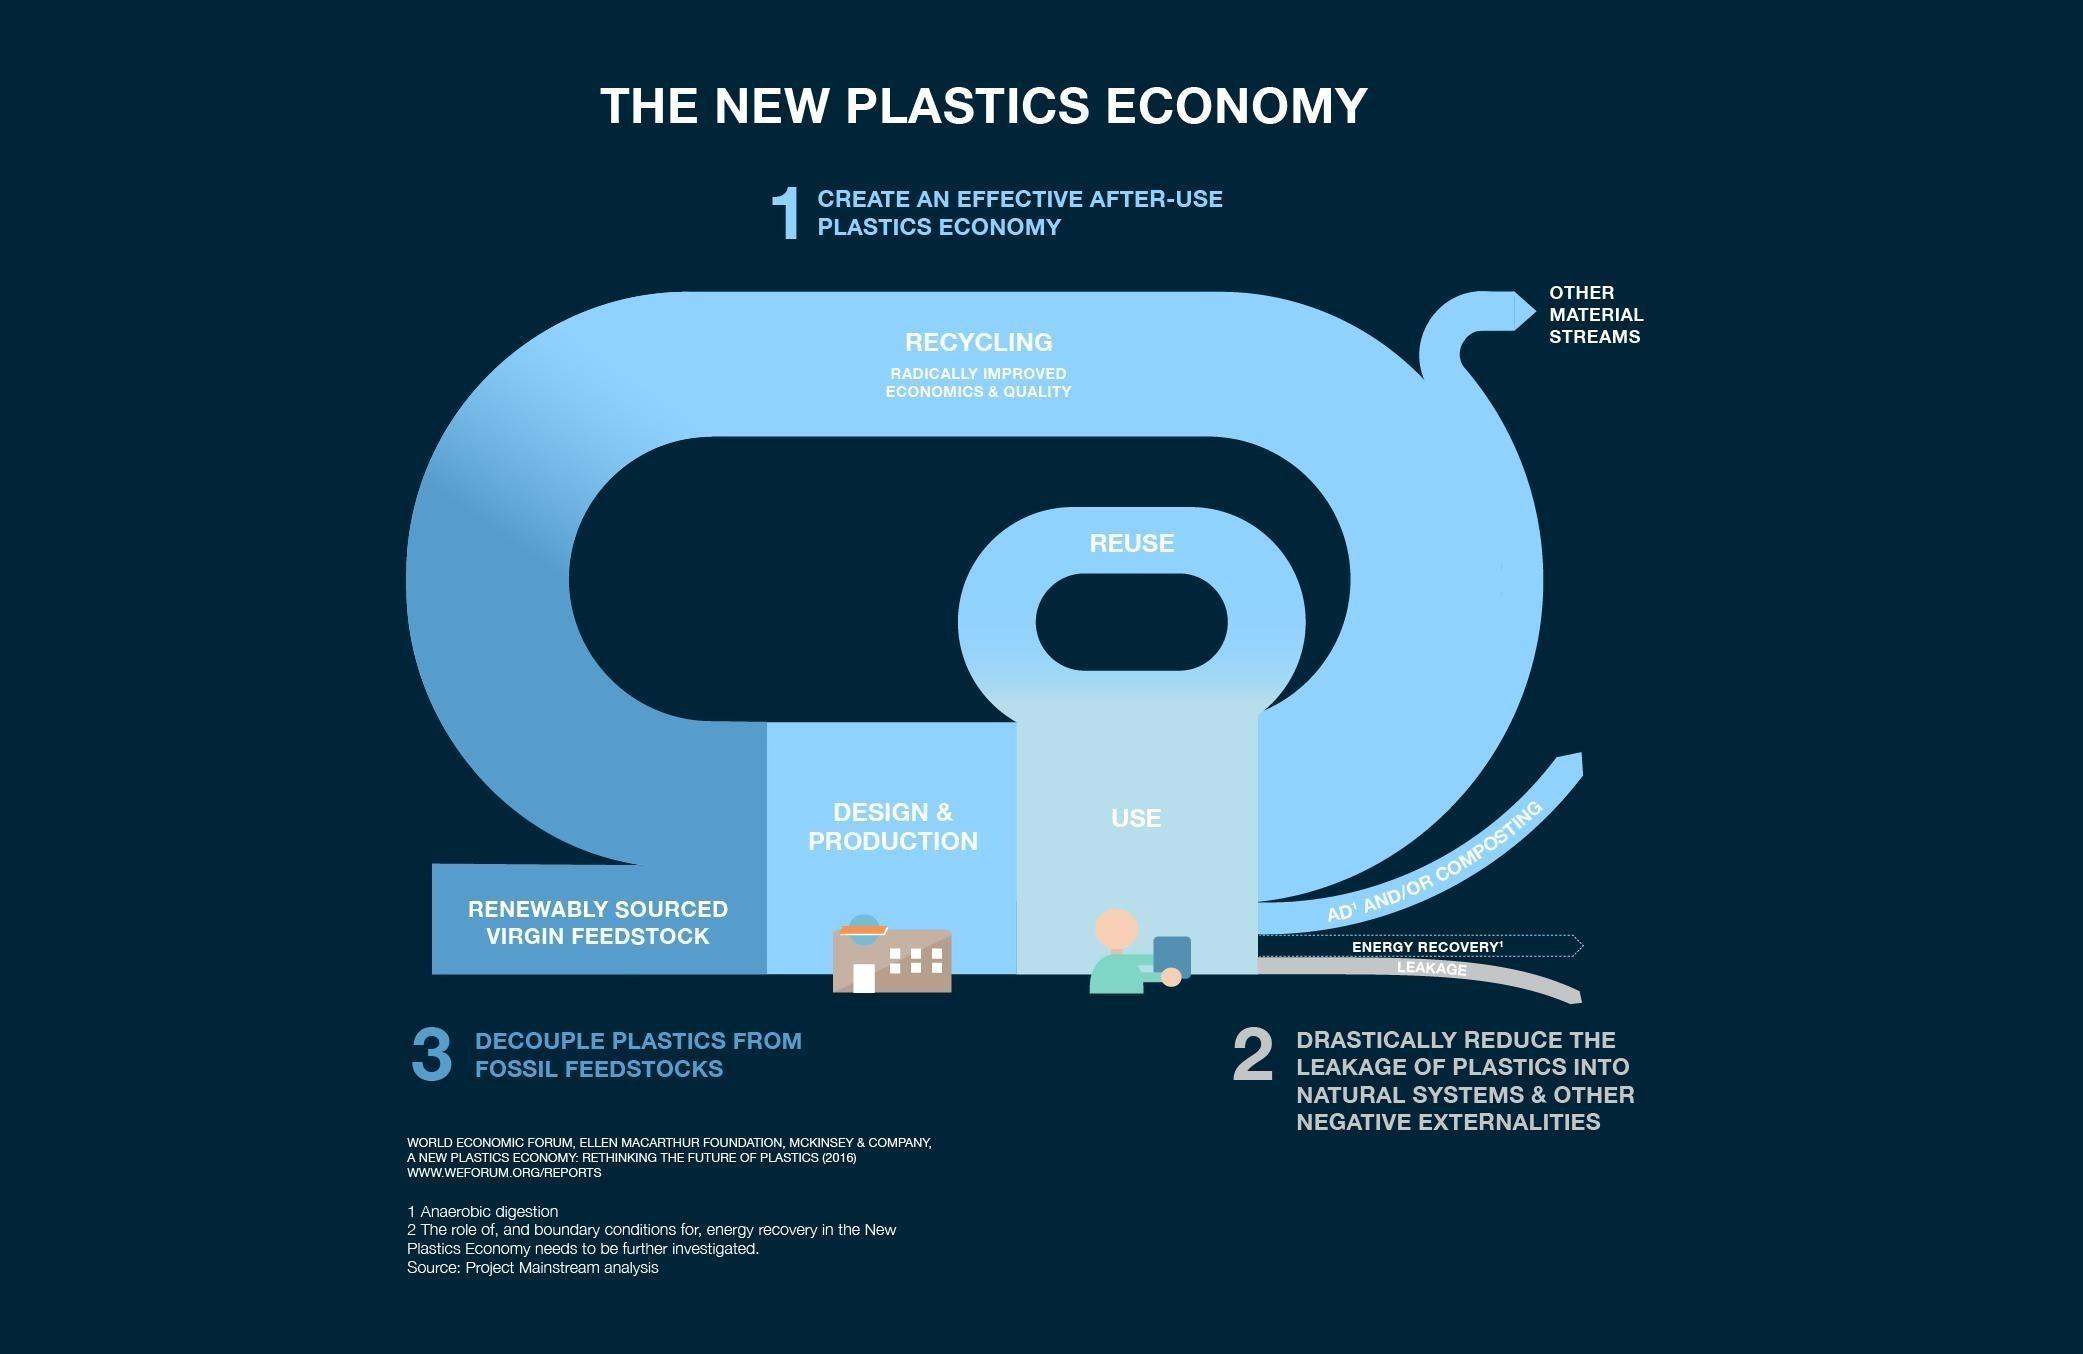 What Are The Drawbacks Of Today S Plastics Economy